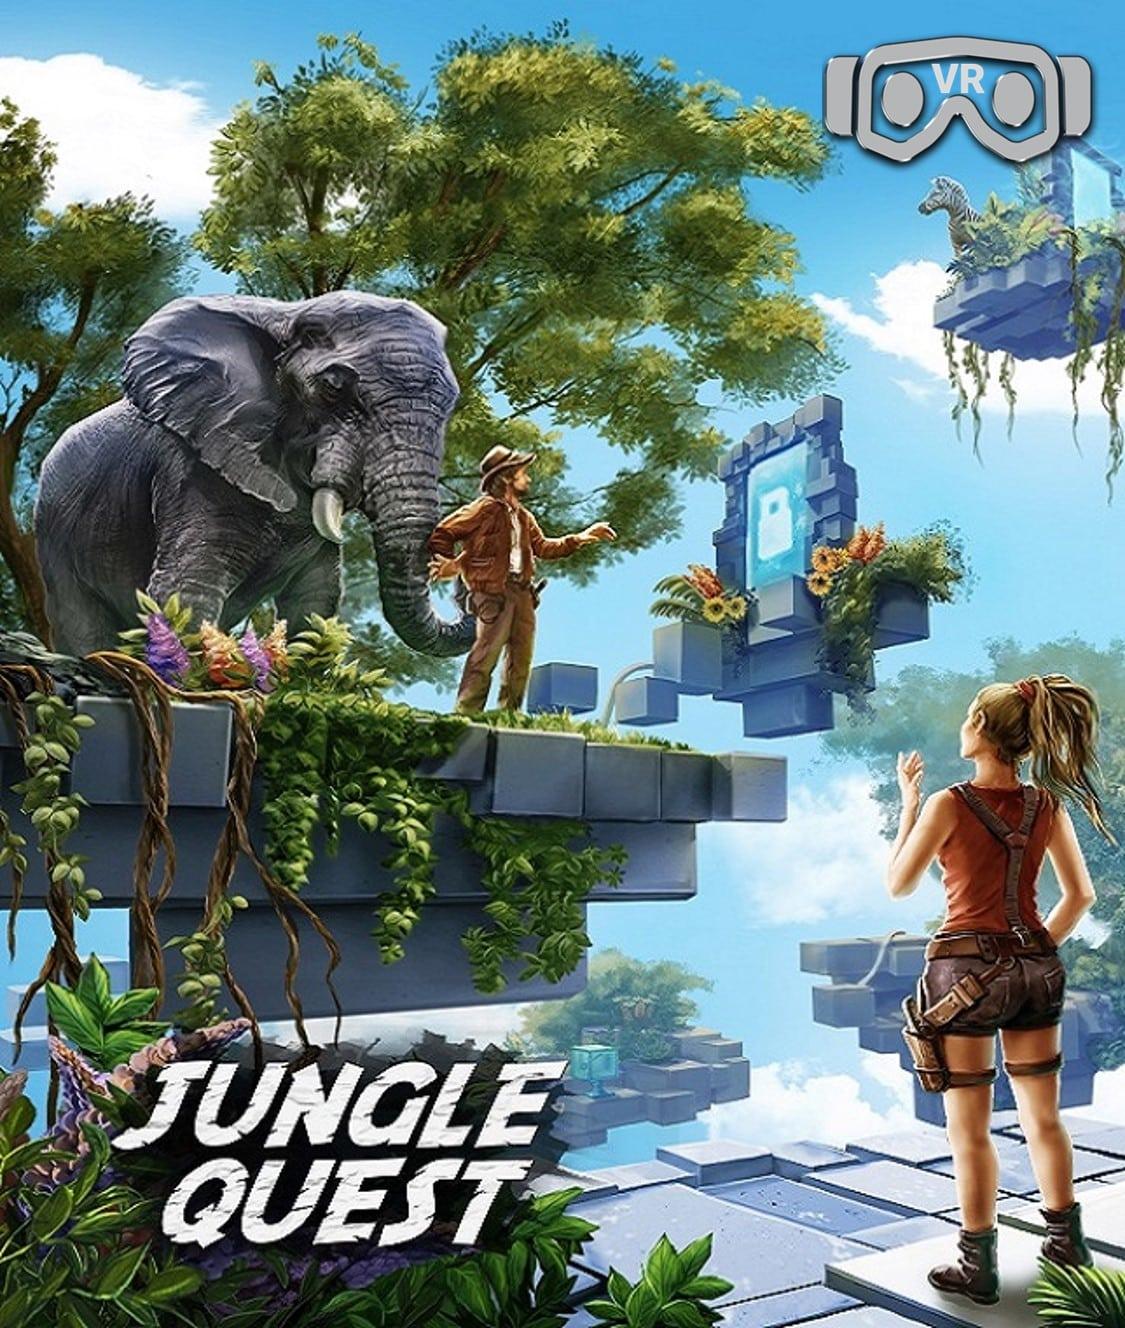 Jungle Quest Entermission Virtual Reality Escape Room x VR